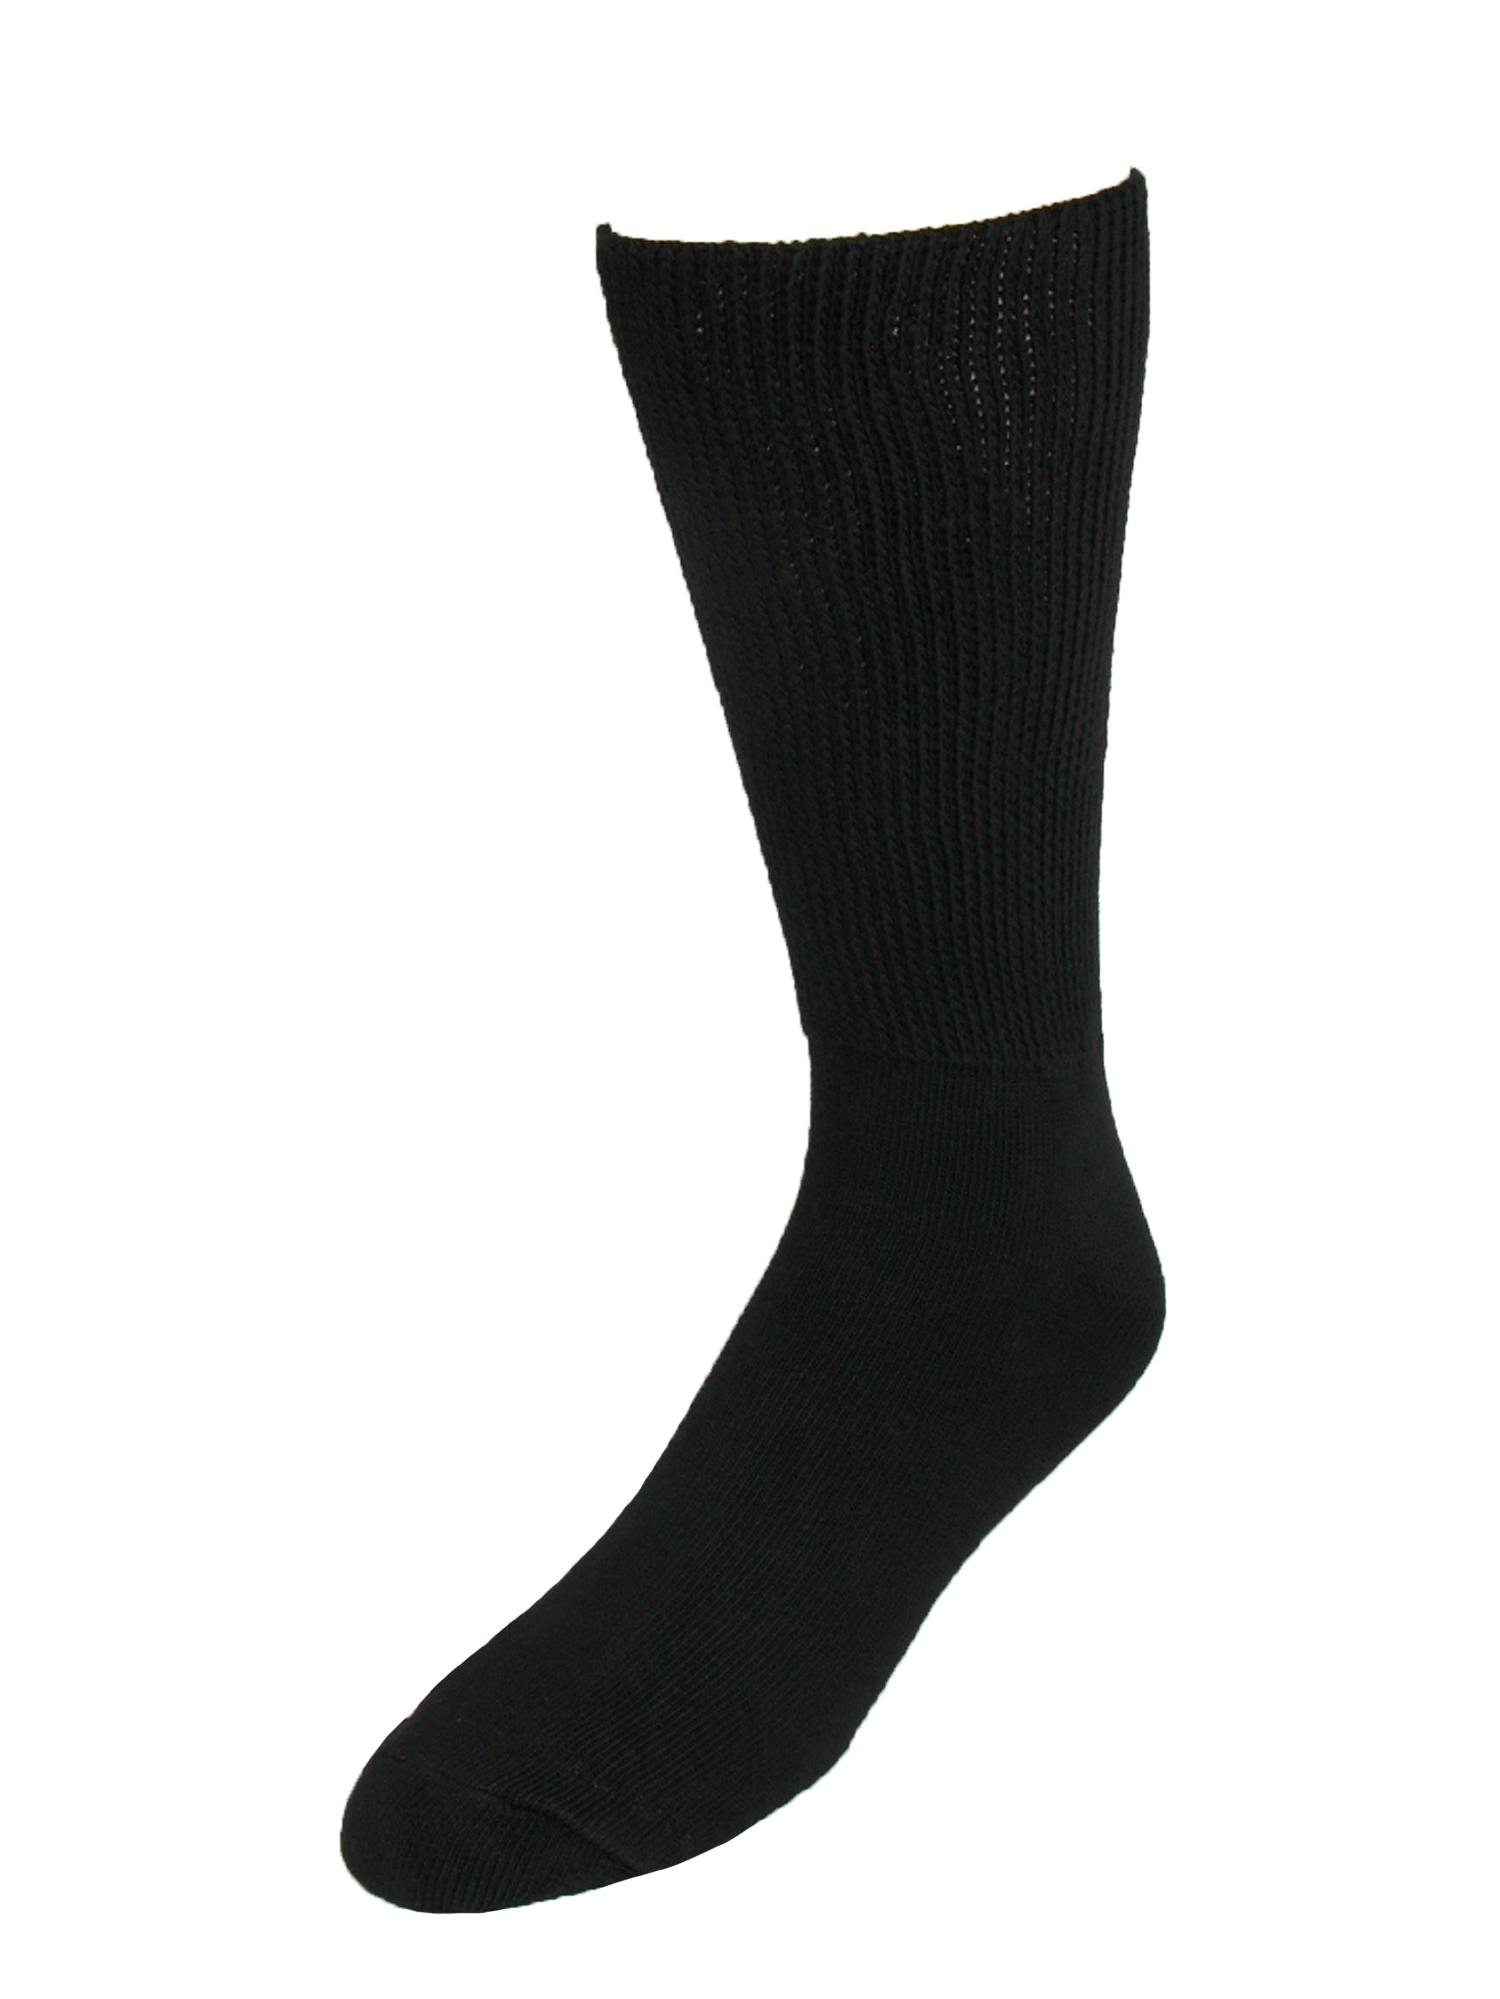 Size Large Mens Cotton Mid Calf Athletic Socks, Black